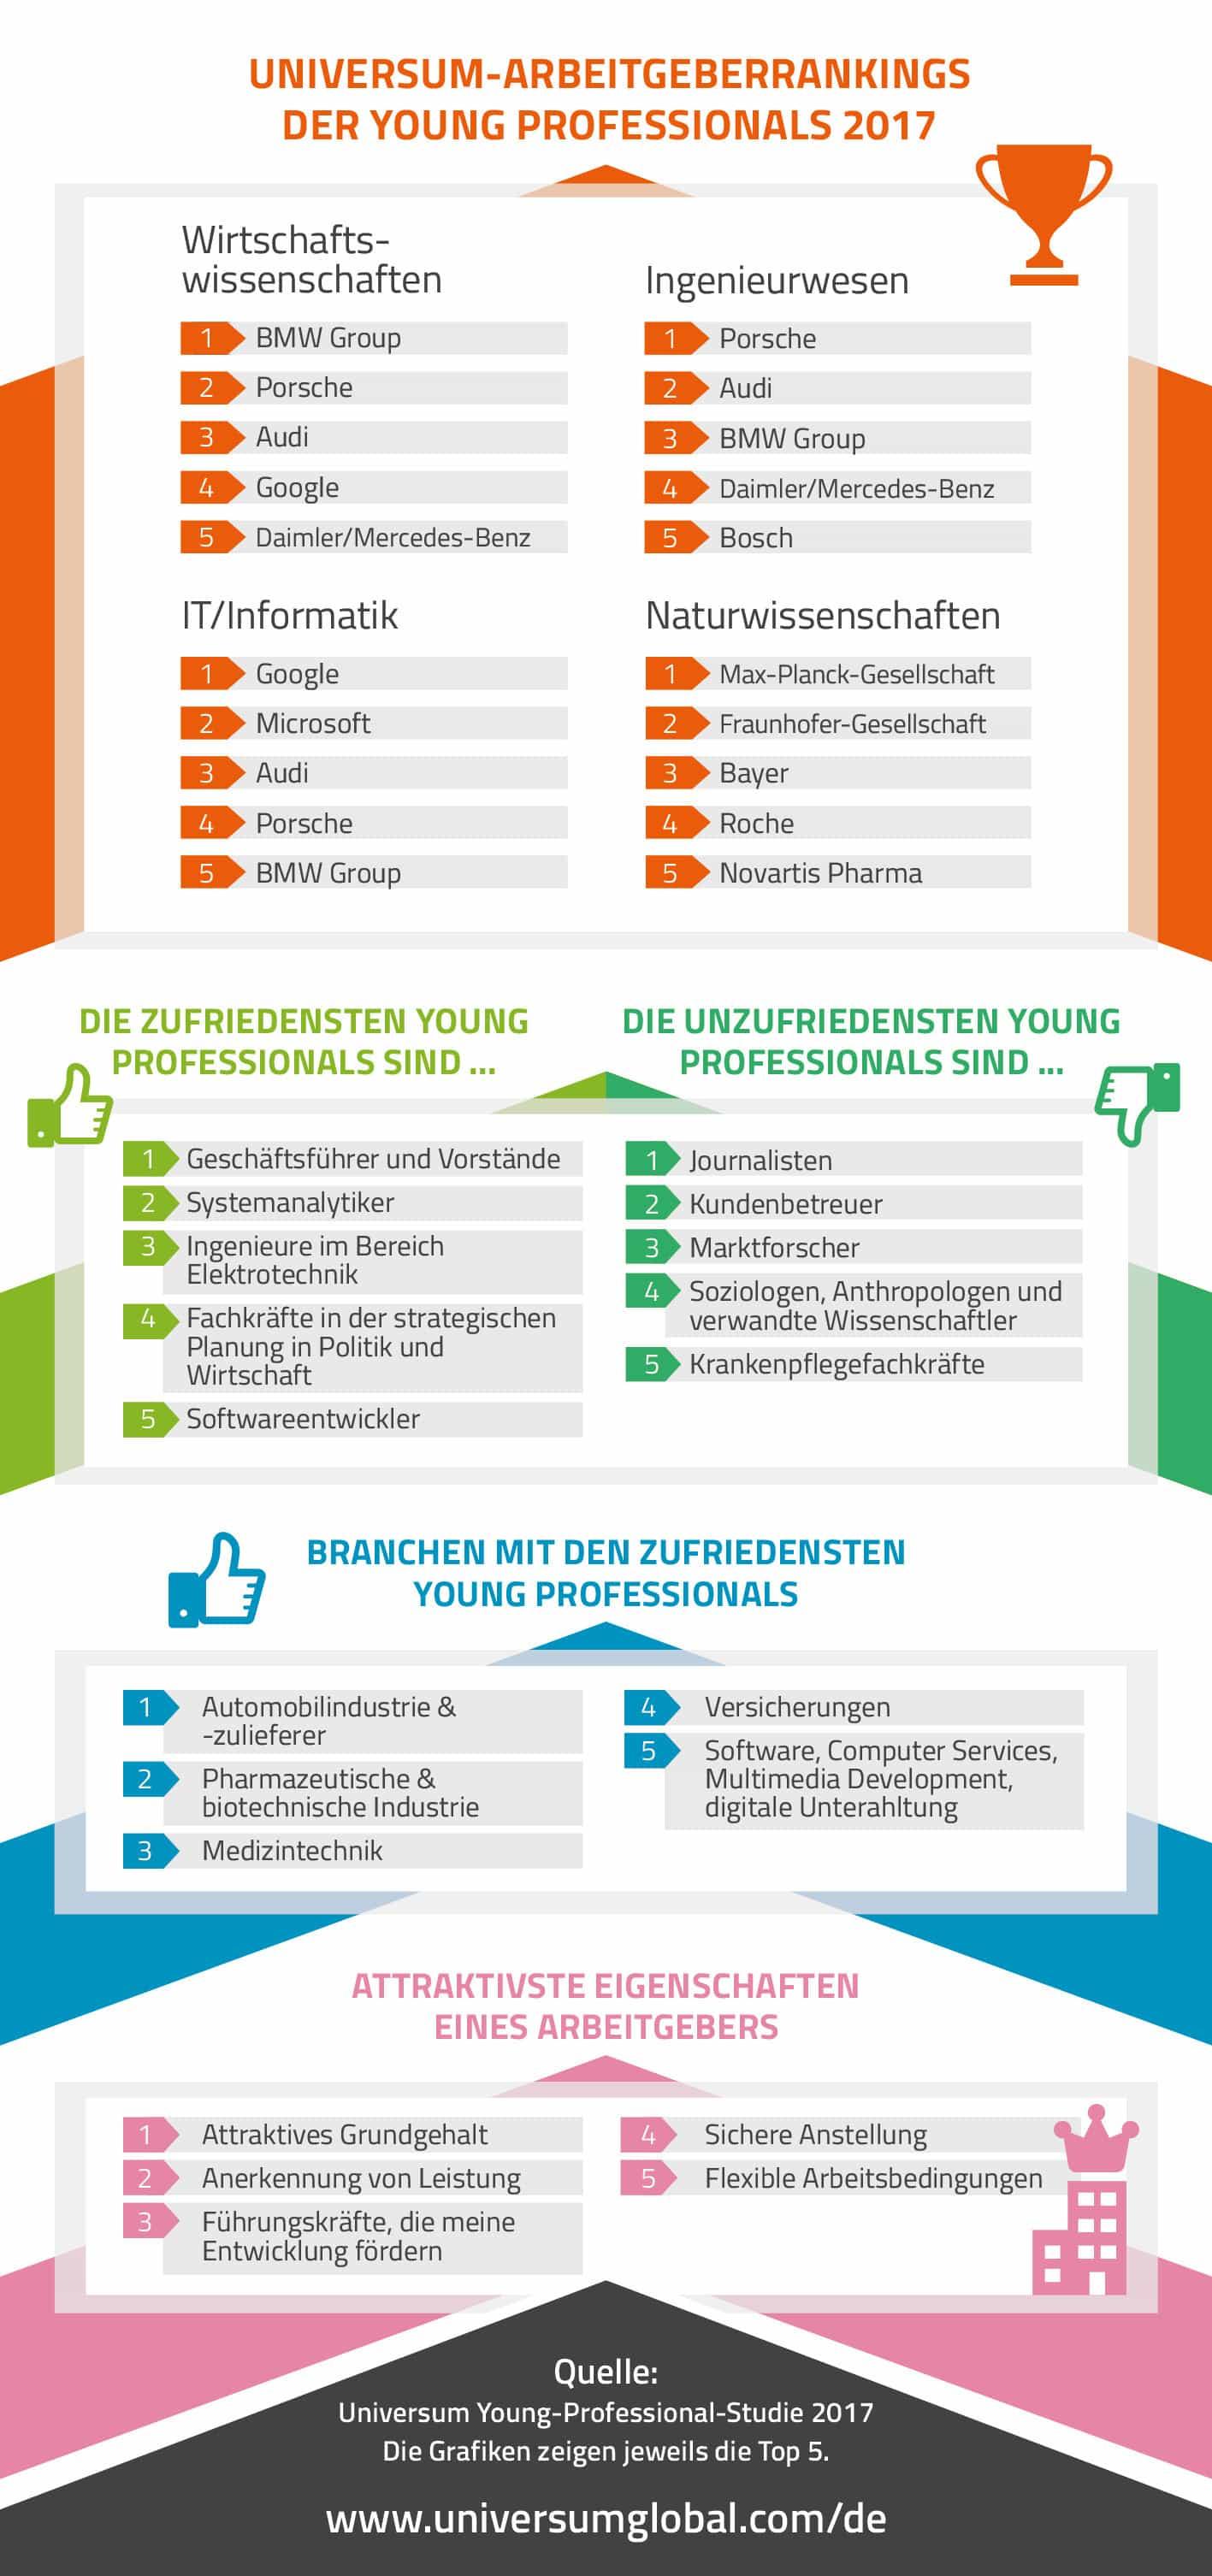 Das Universum Young Professional Ranking 2017